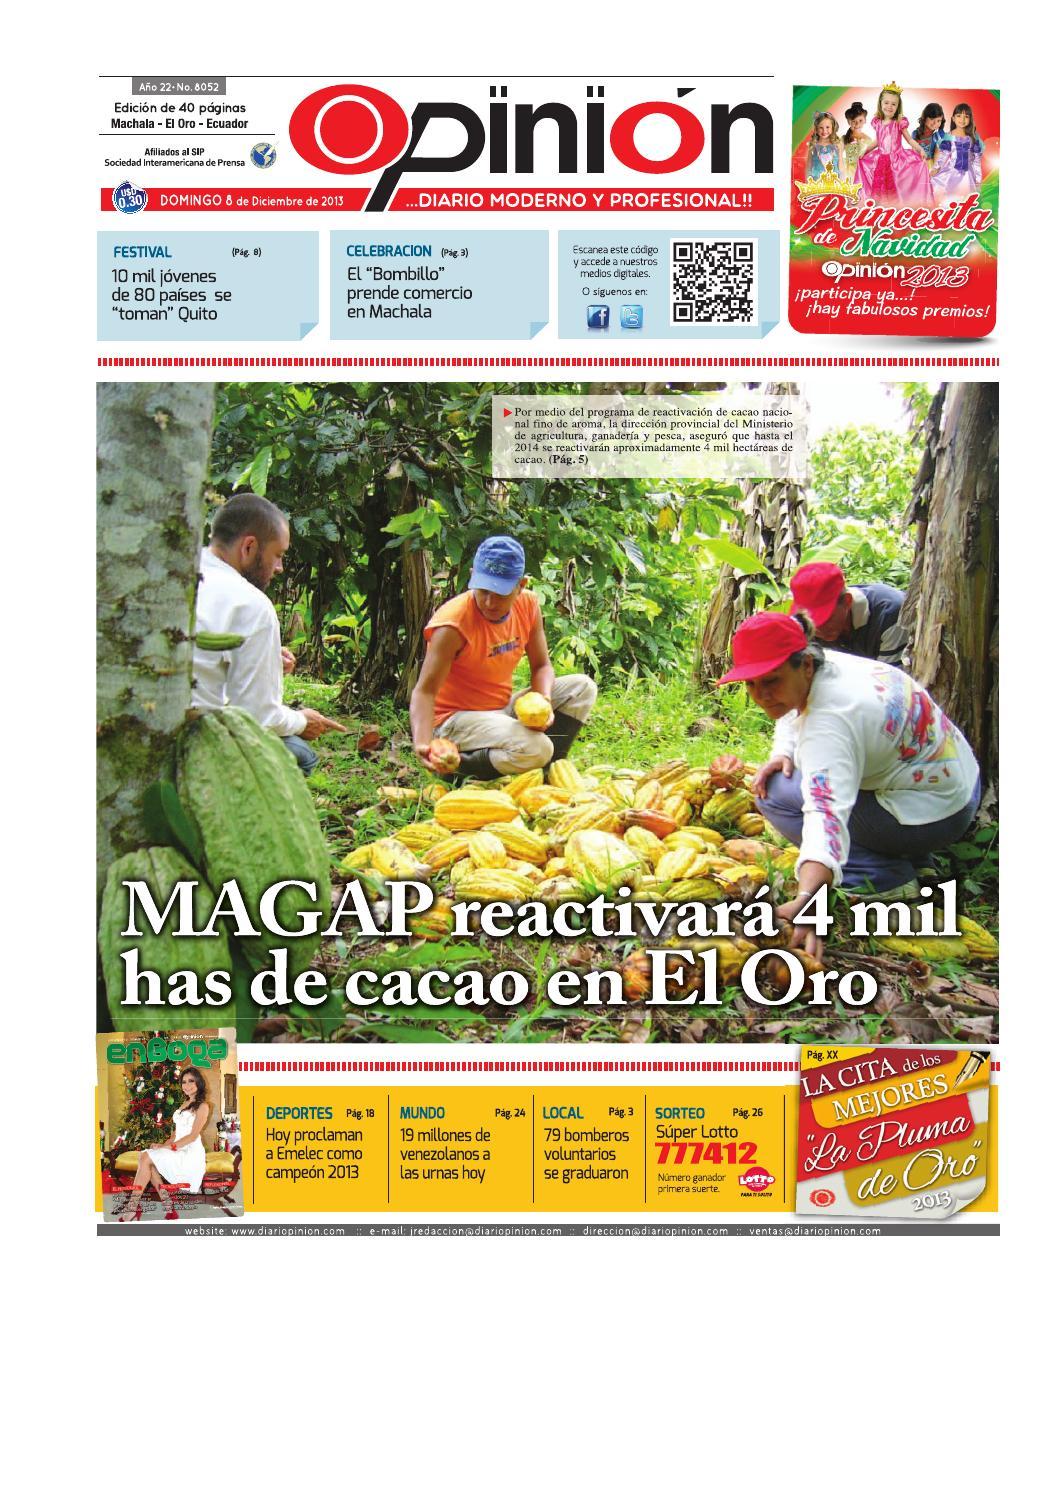 Impreso 08 12 13 by Diario Opinion - issuu